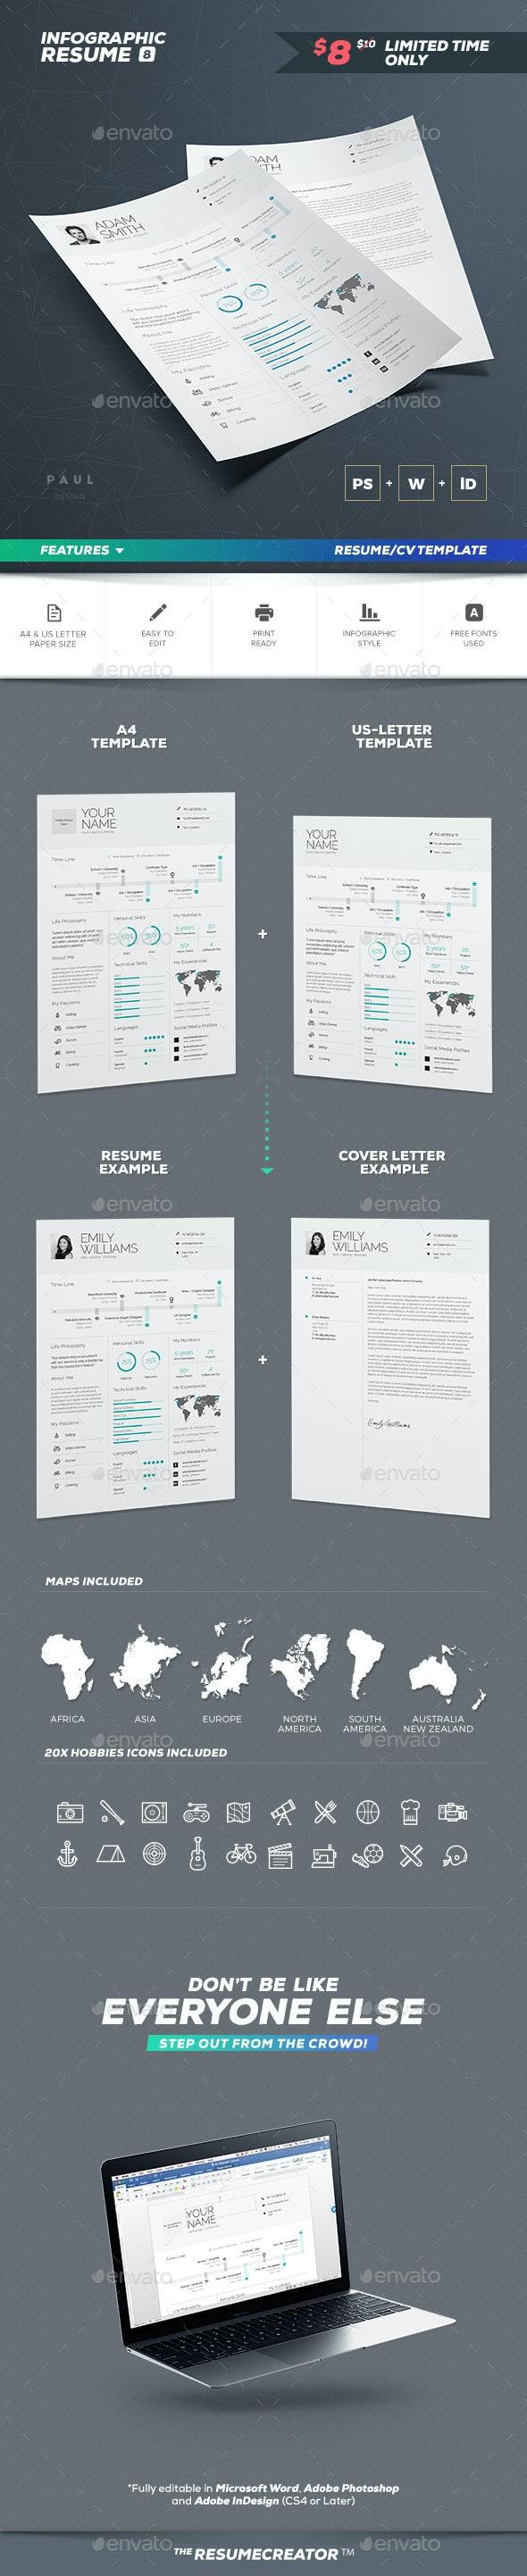 Infographic Resume/Cv Volume 8 - Resumes Stationery